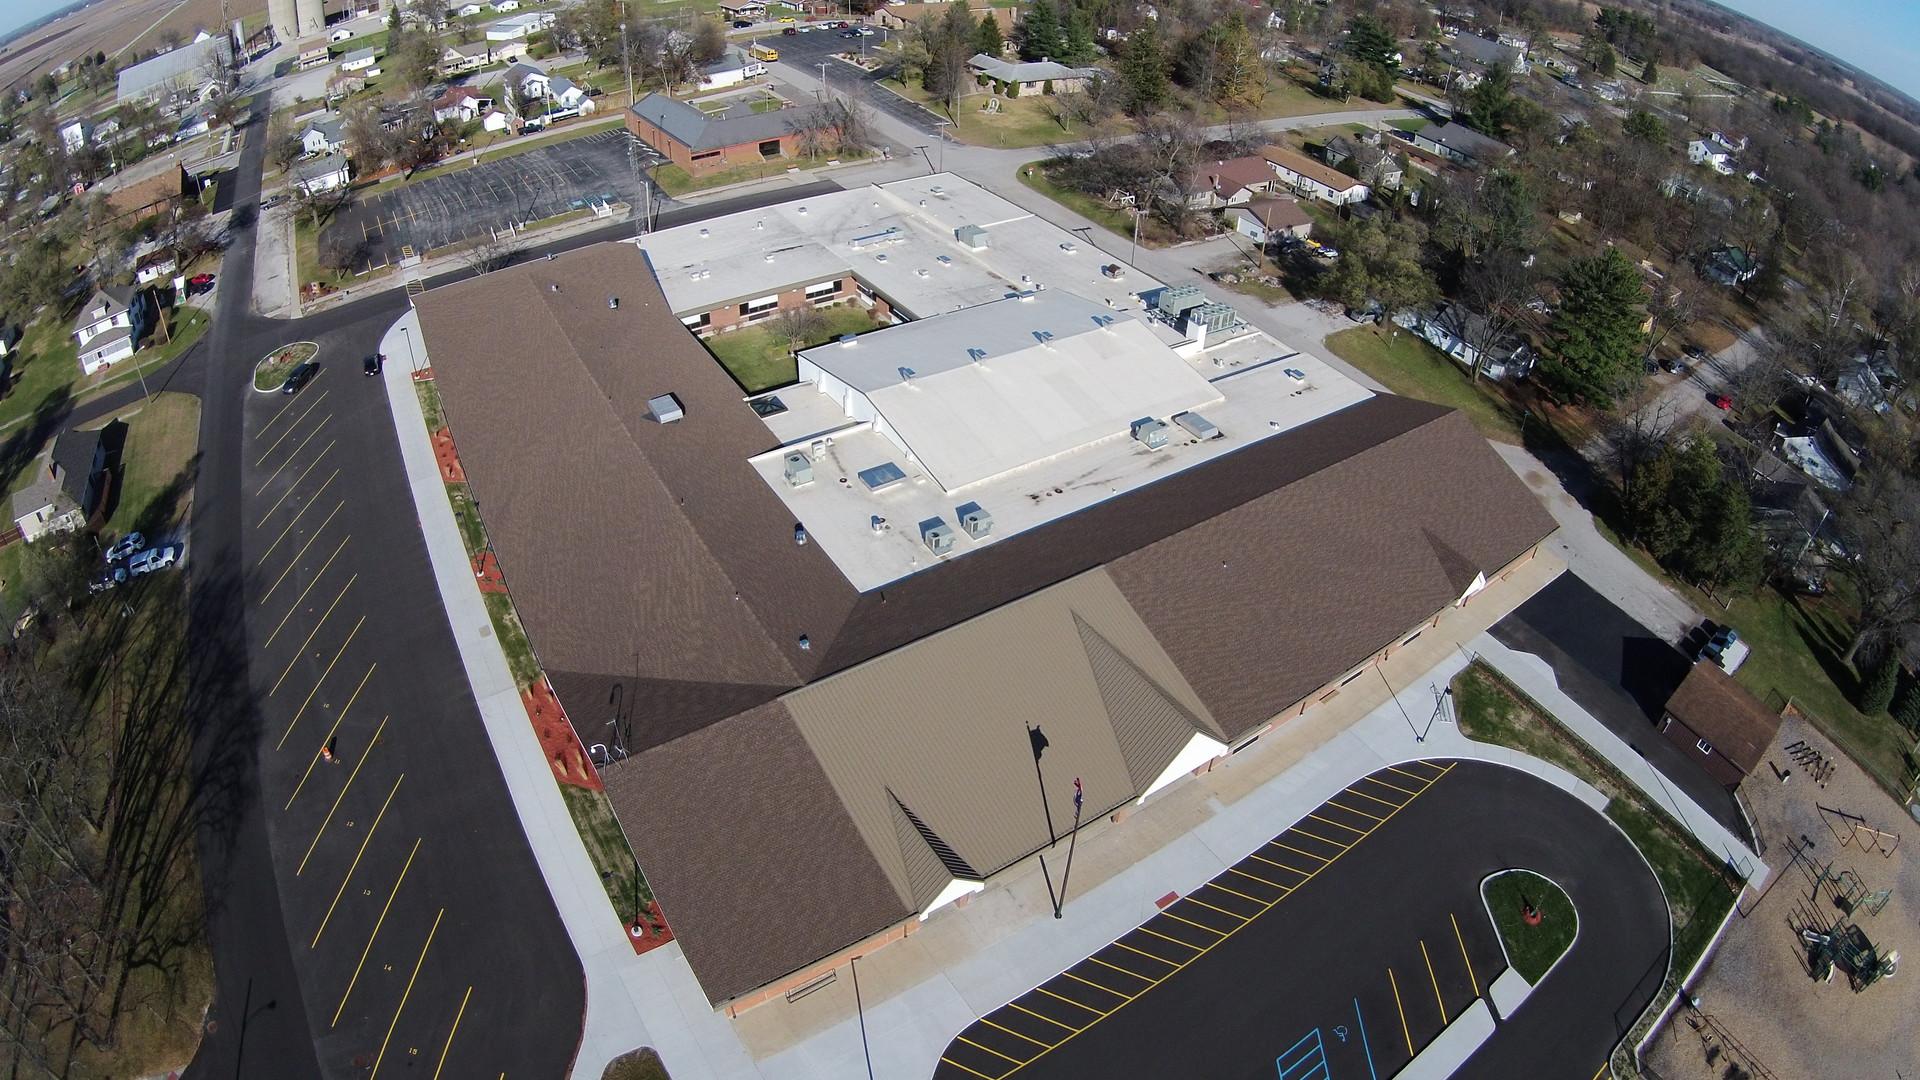 KV Wheatfield Elementary School